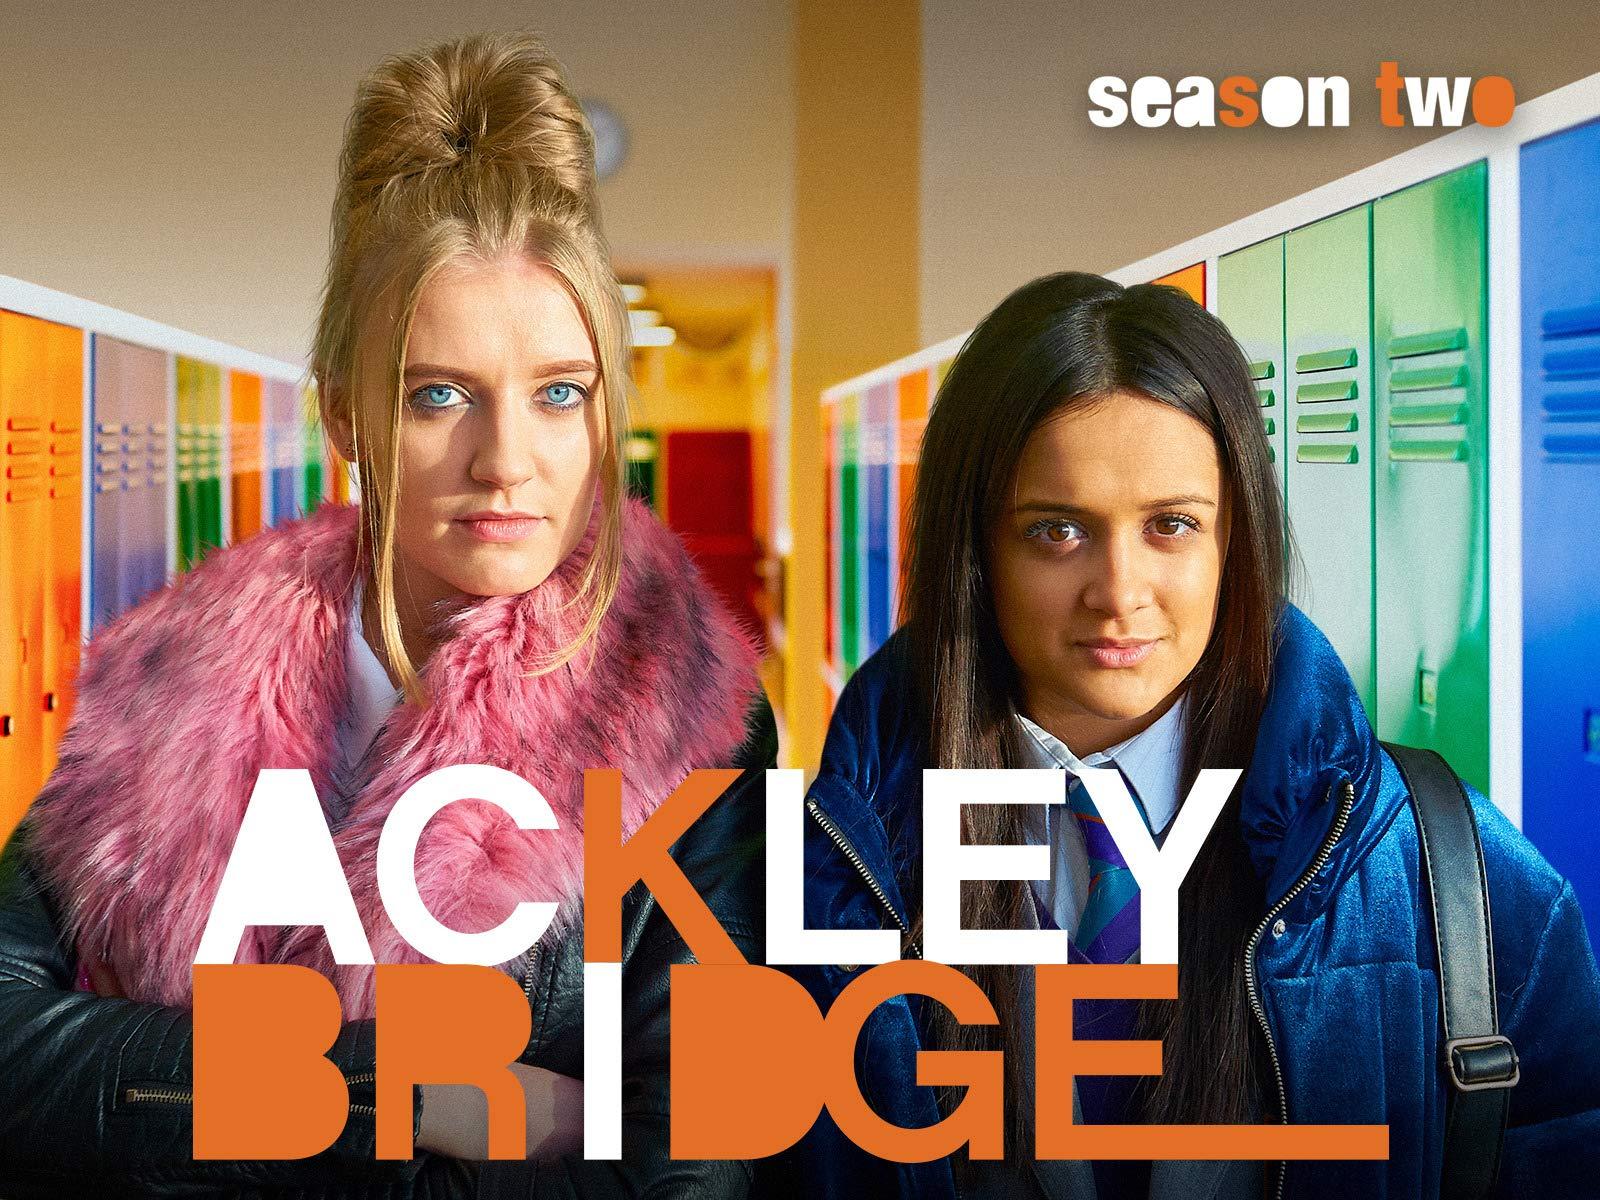 Ackley Bridge - Season 2